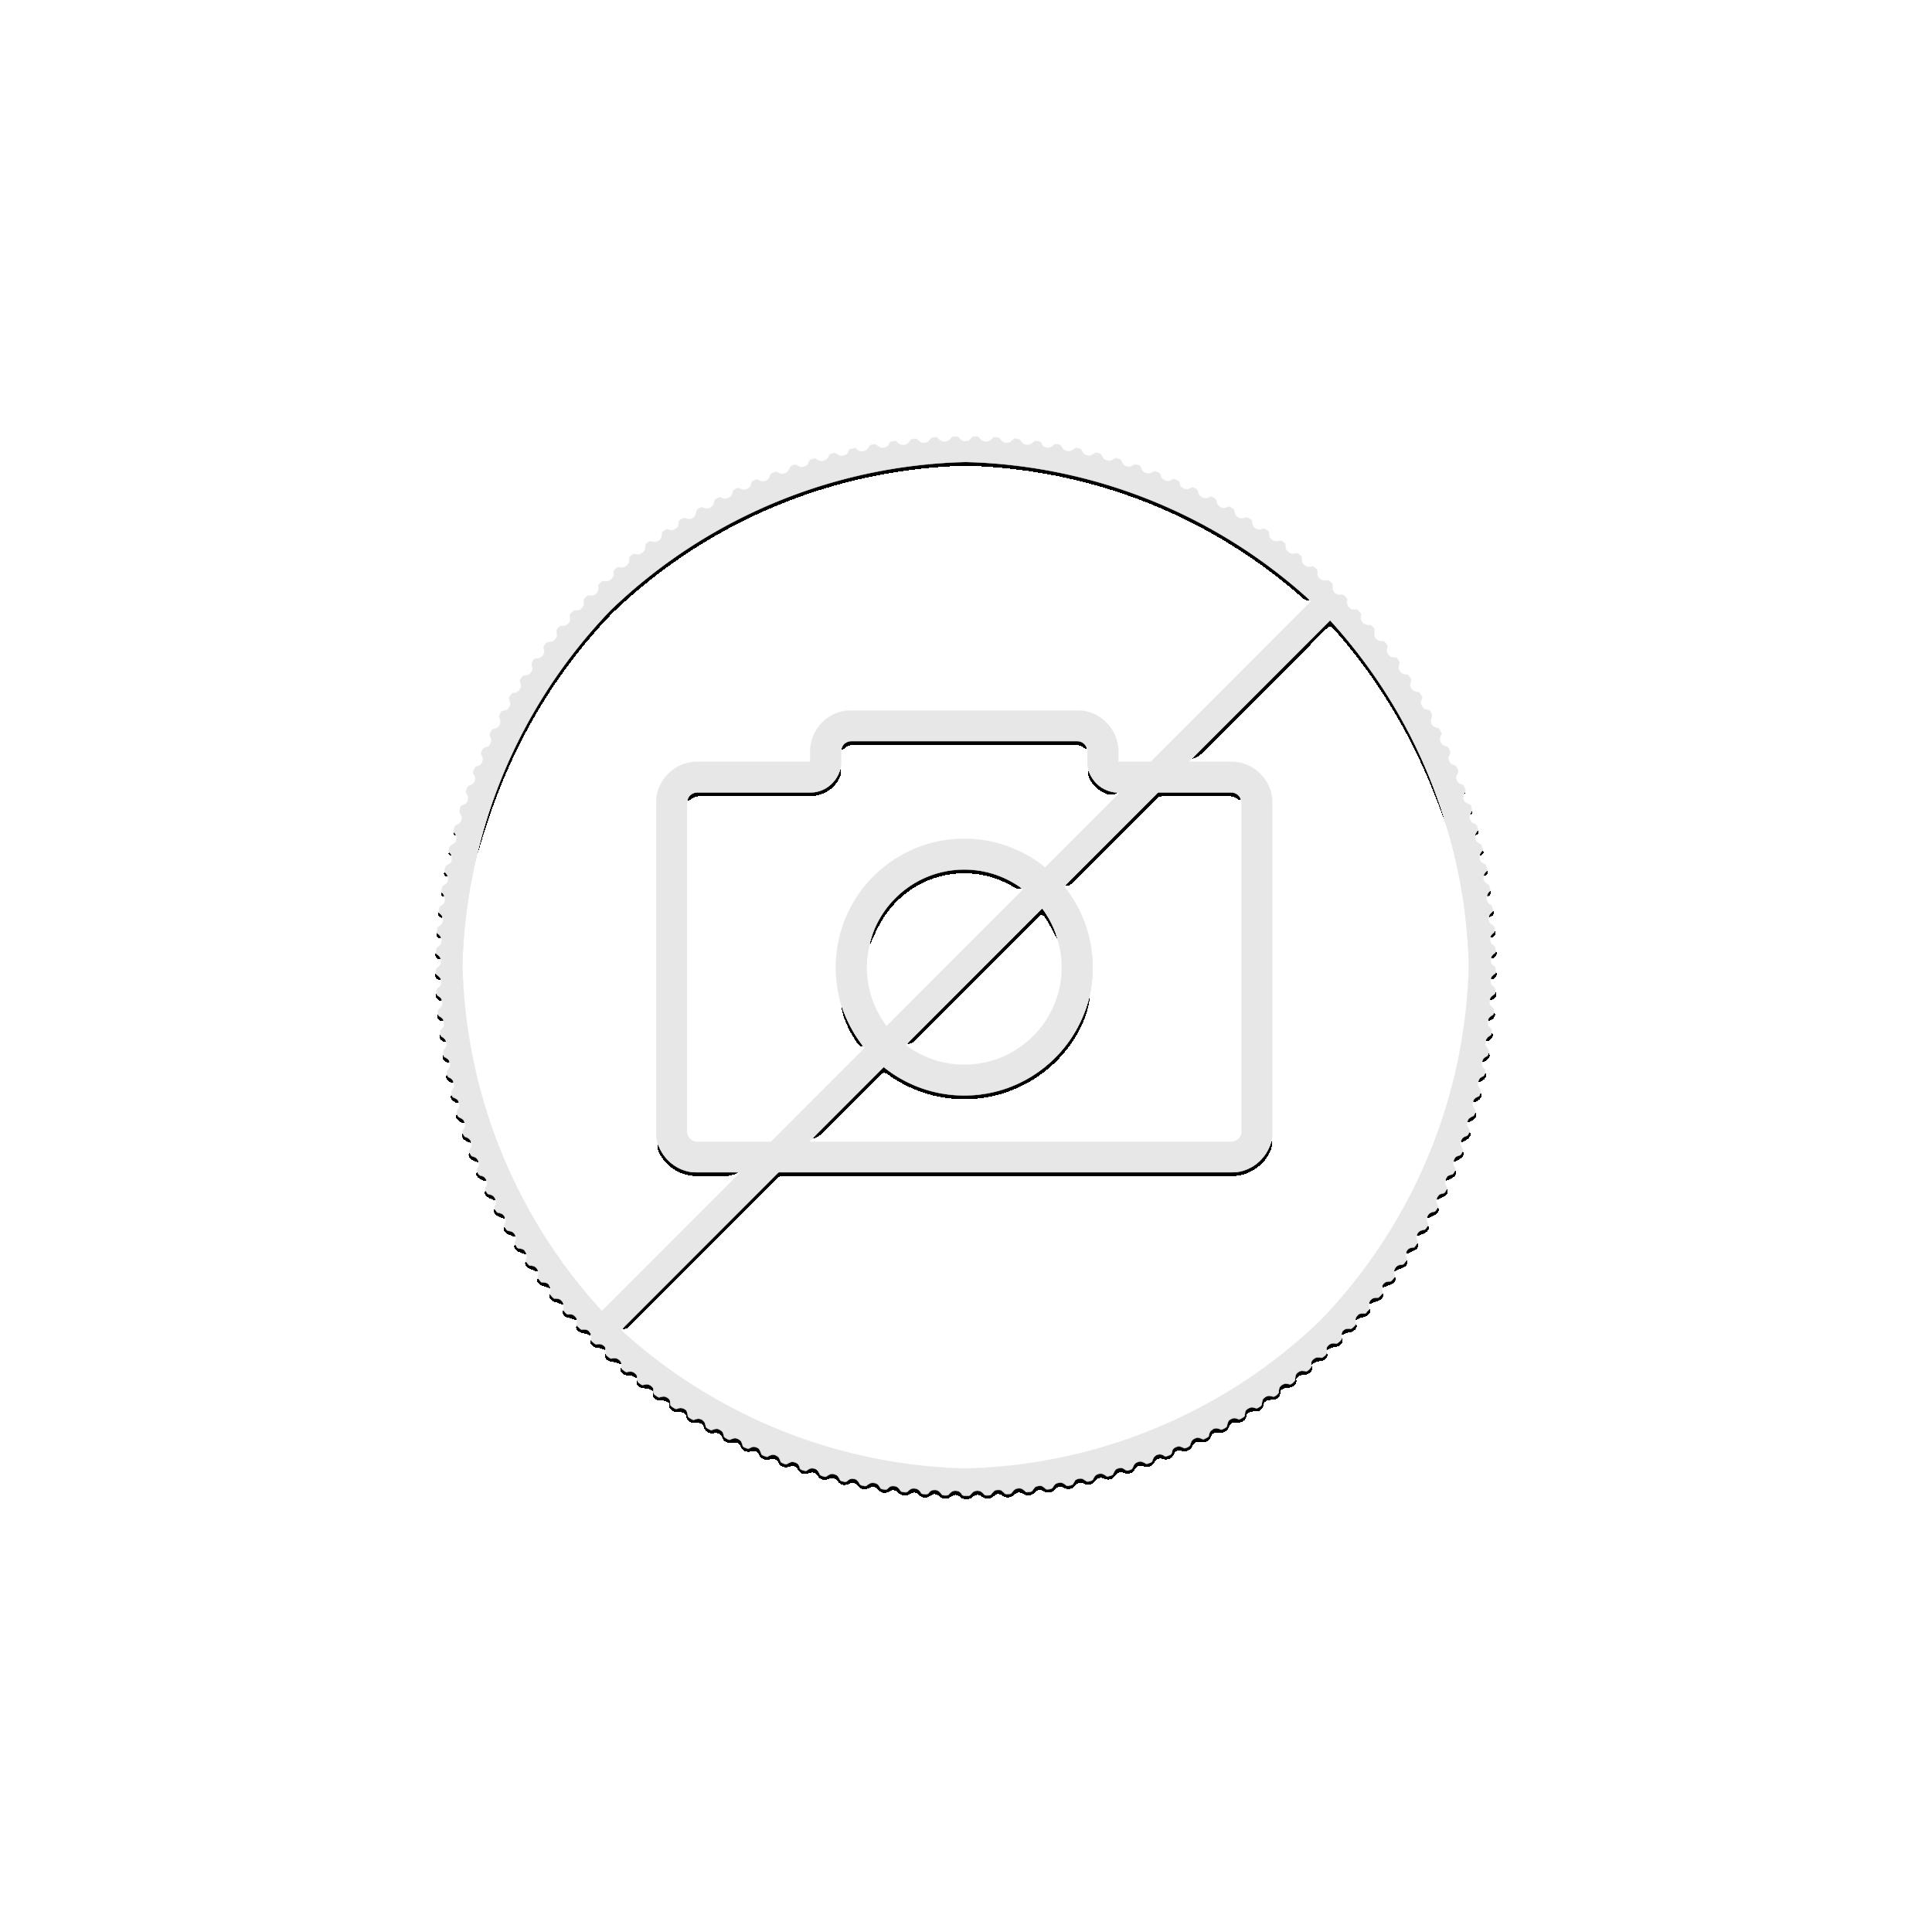 1,5 troy ounce zilveren credit card munt 2020